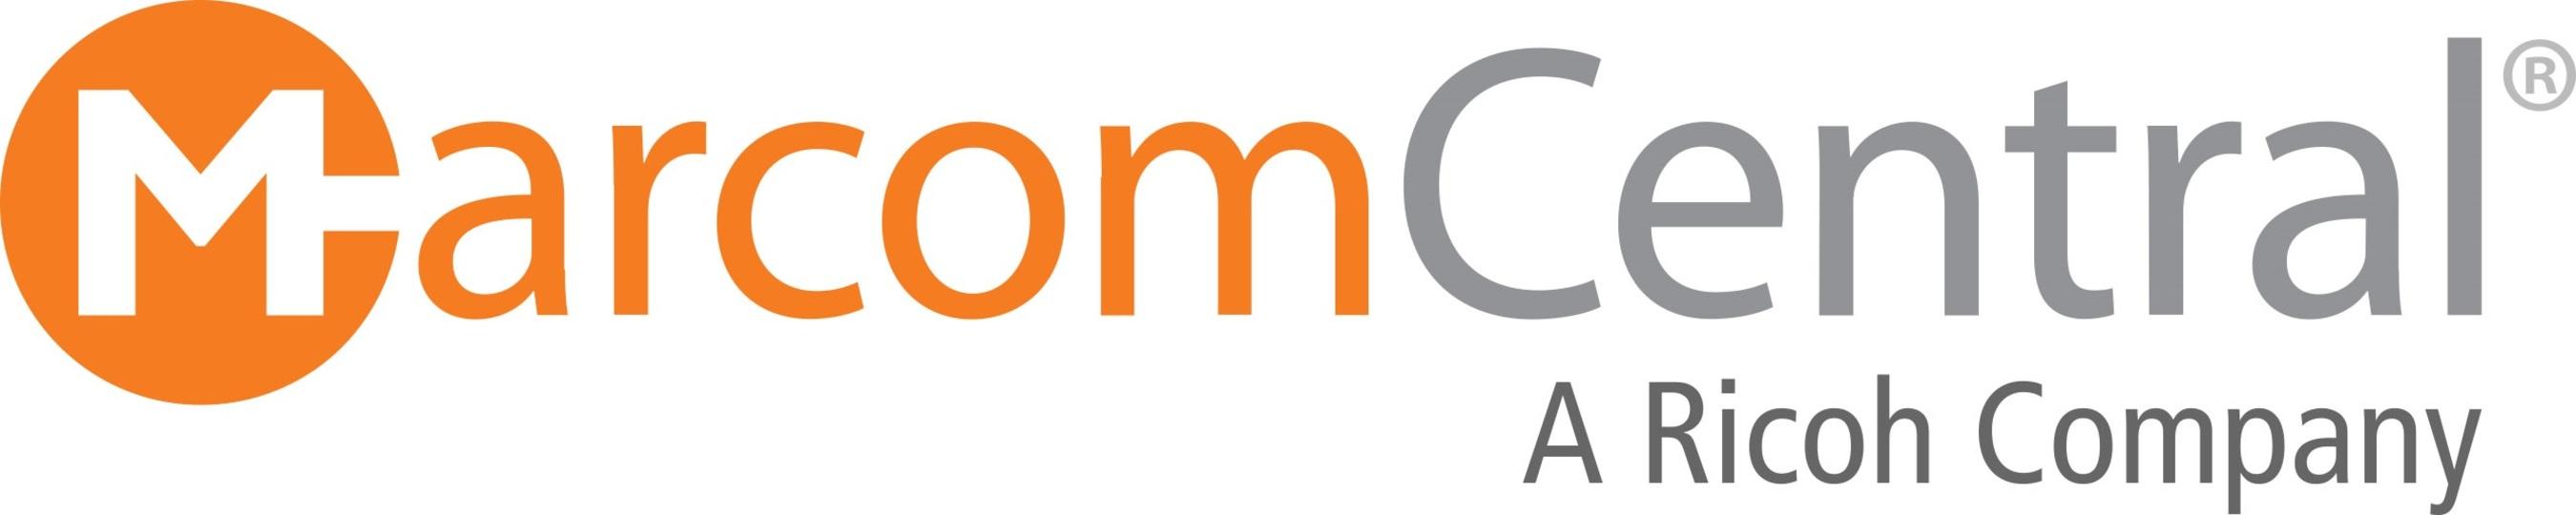 New MarcomCentral logo. (PRNewsFoto/MarcomCentral)